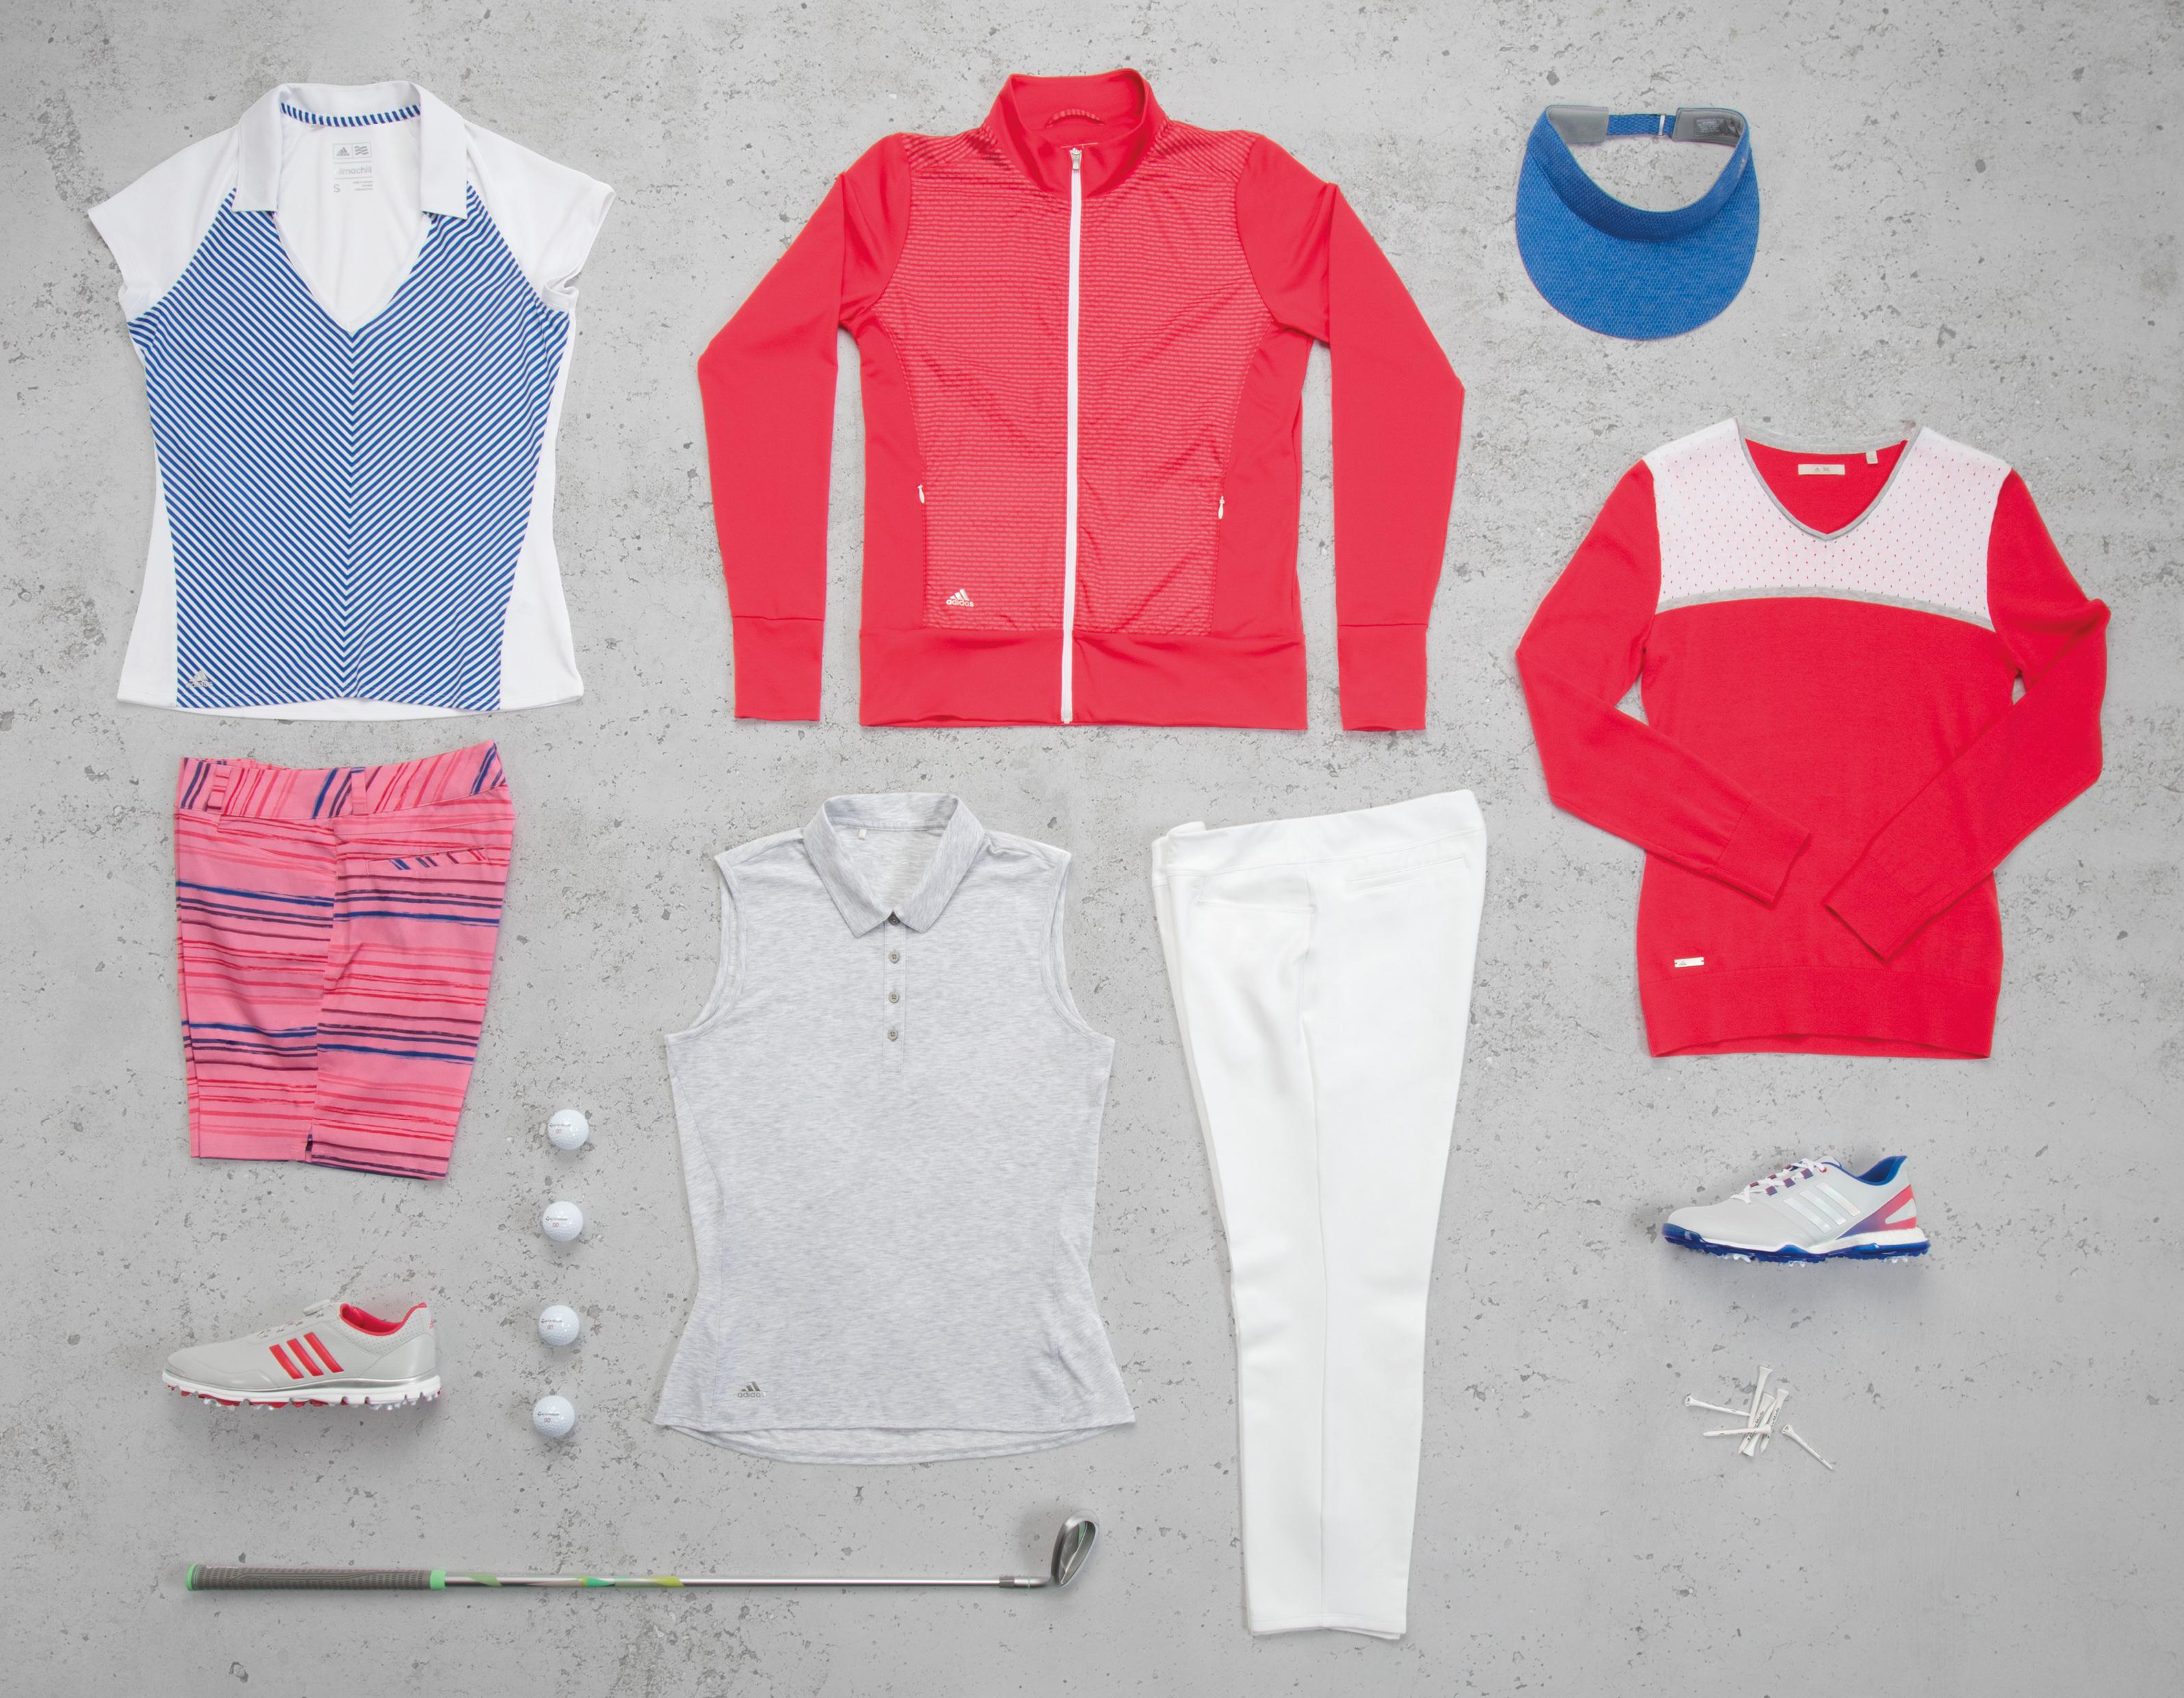 dd171cb38c2e Adidas reveals 2017 Spring Summer apparel range